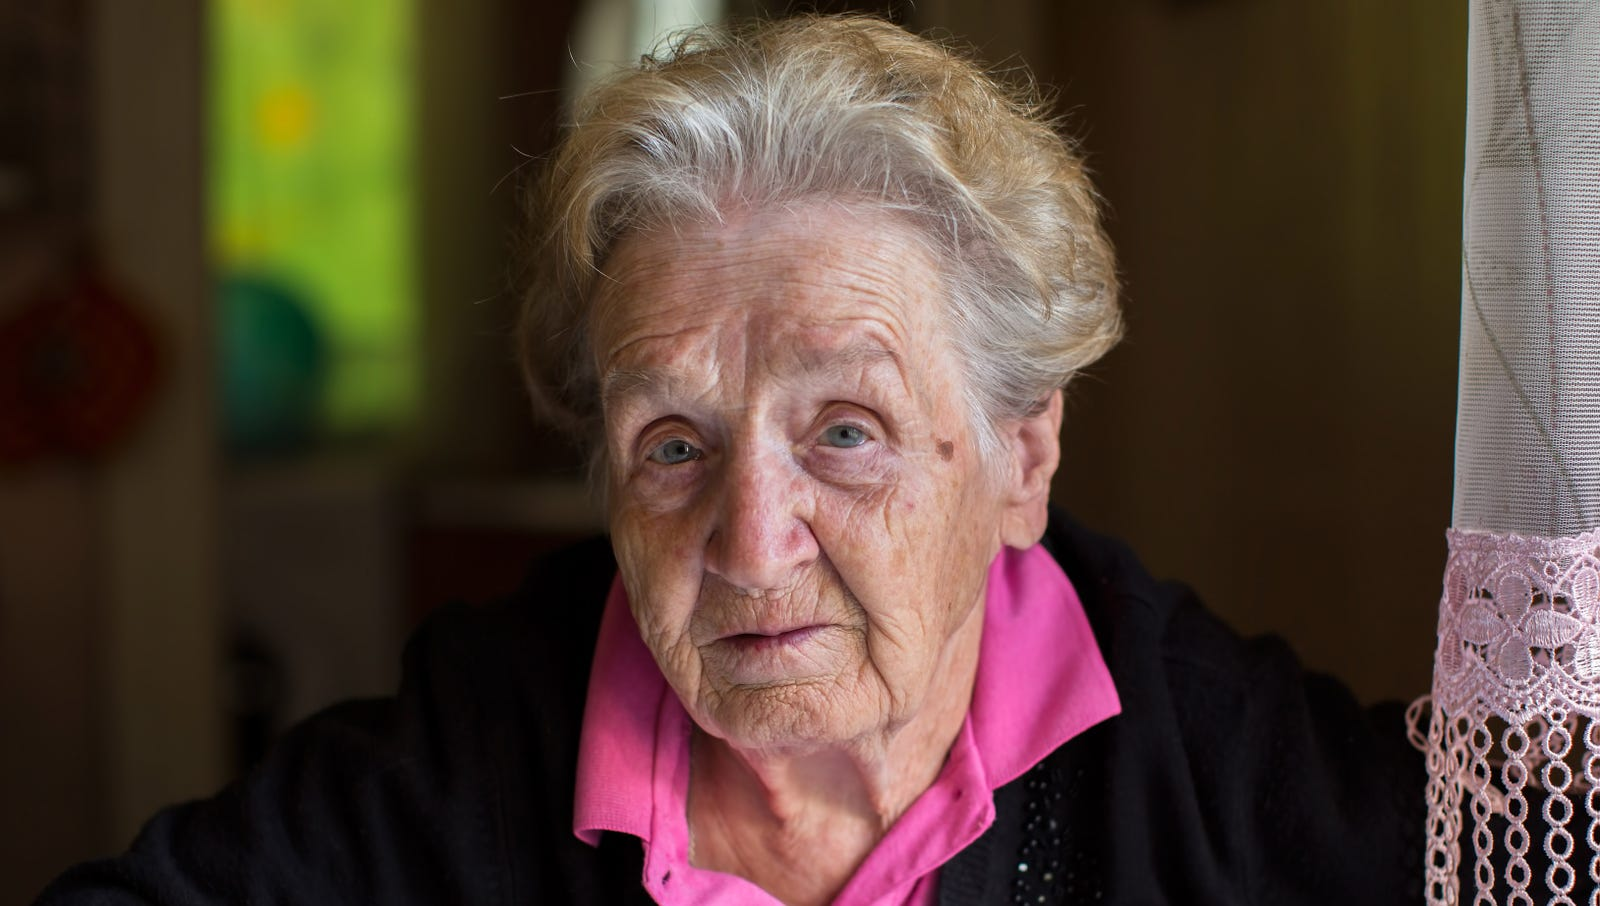 Grandma Looking Like Absolute Shit Lately